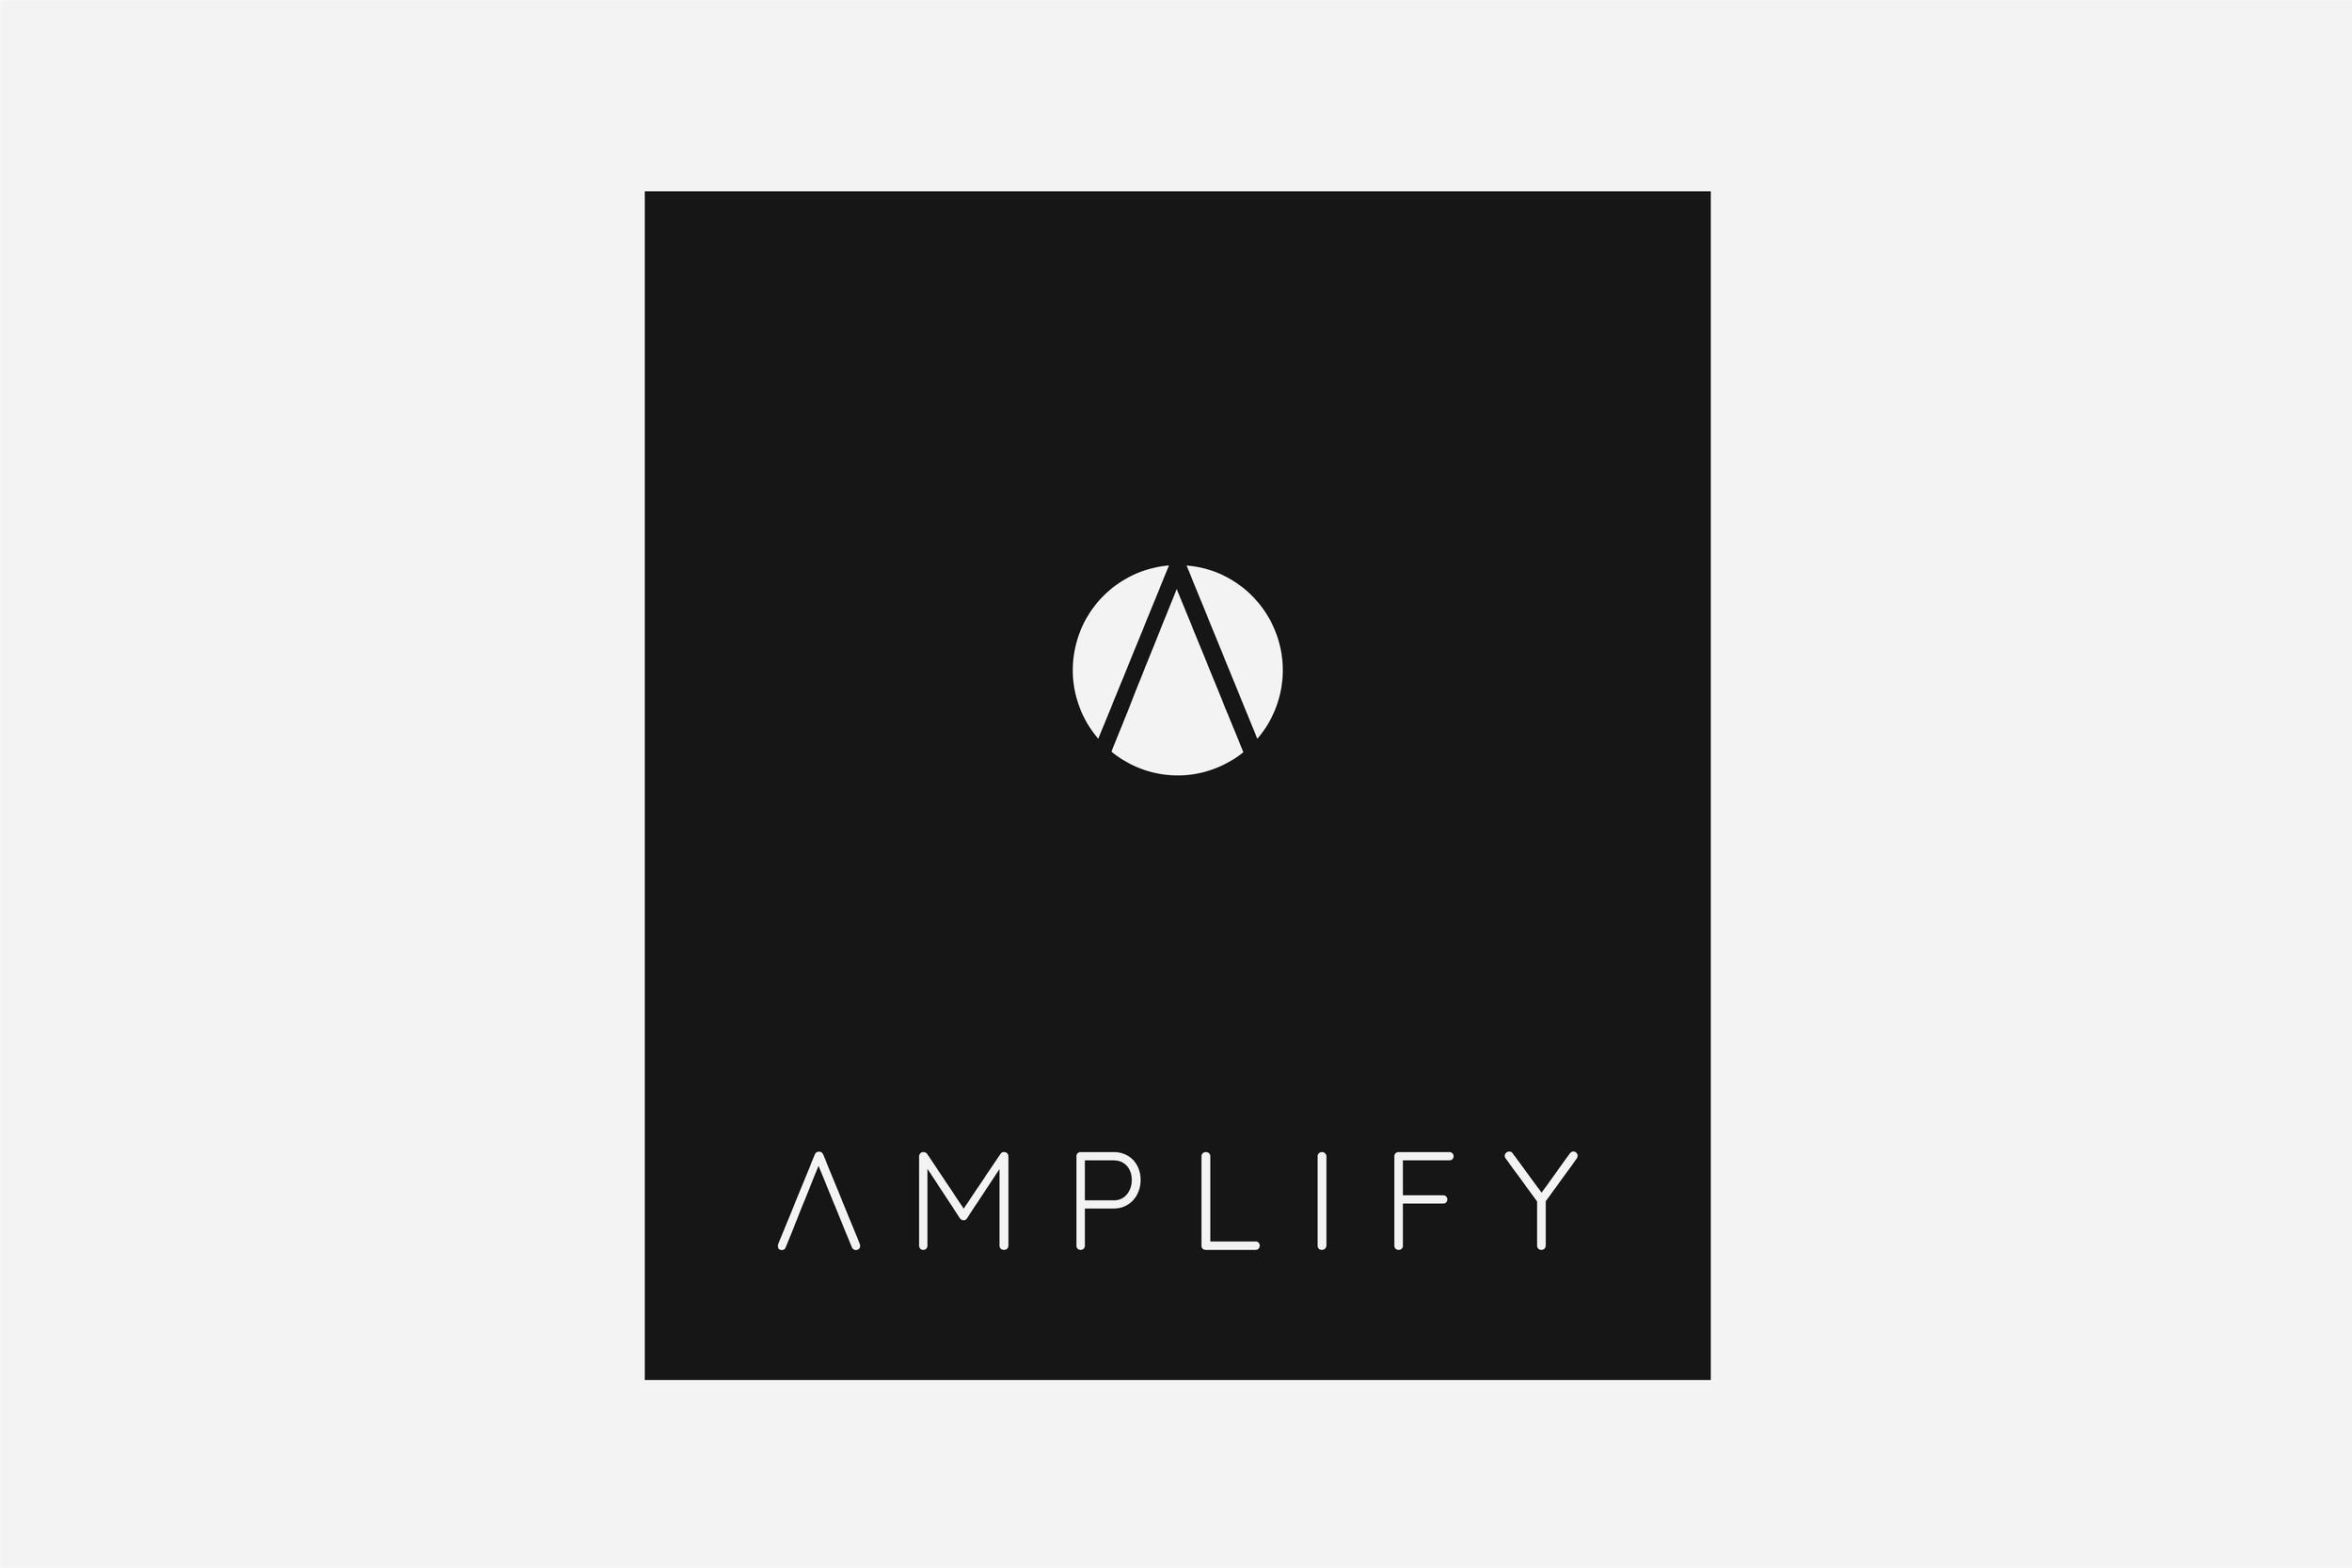 KaterinaLeslie_Amplify_LogoDesign.png